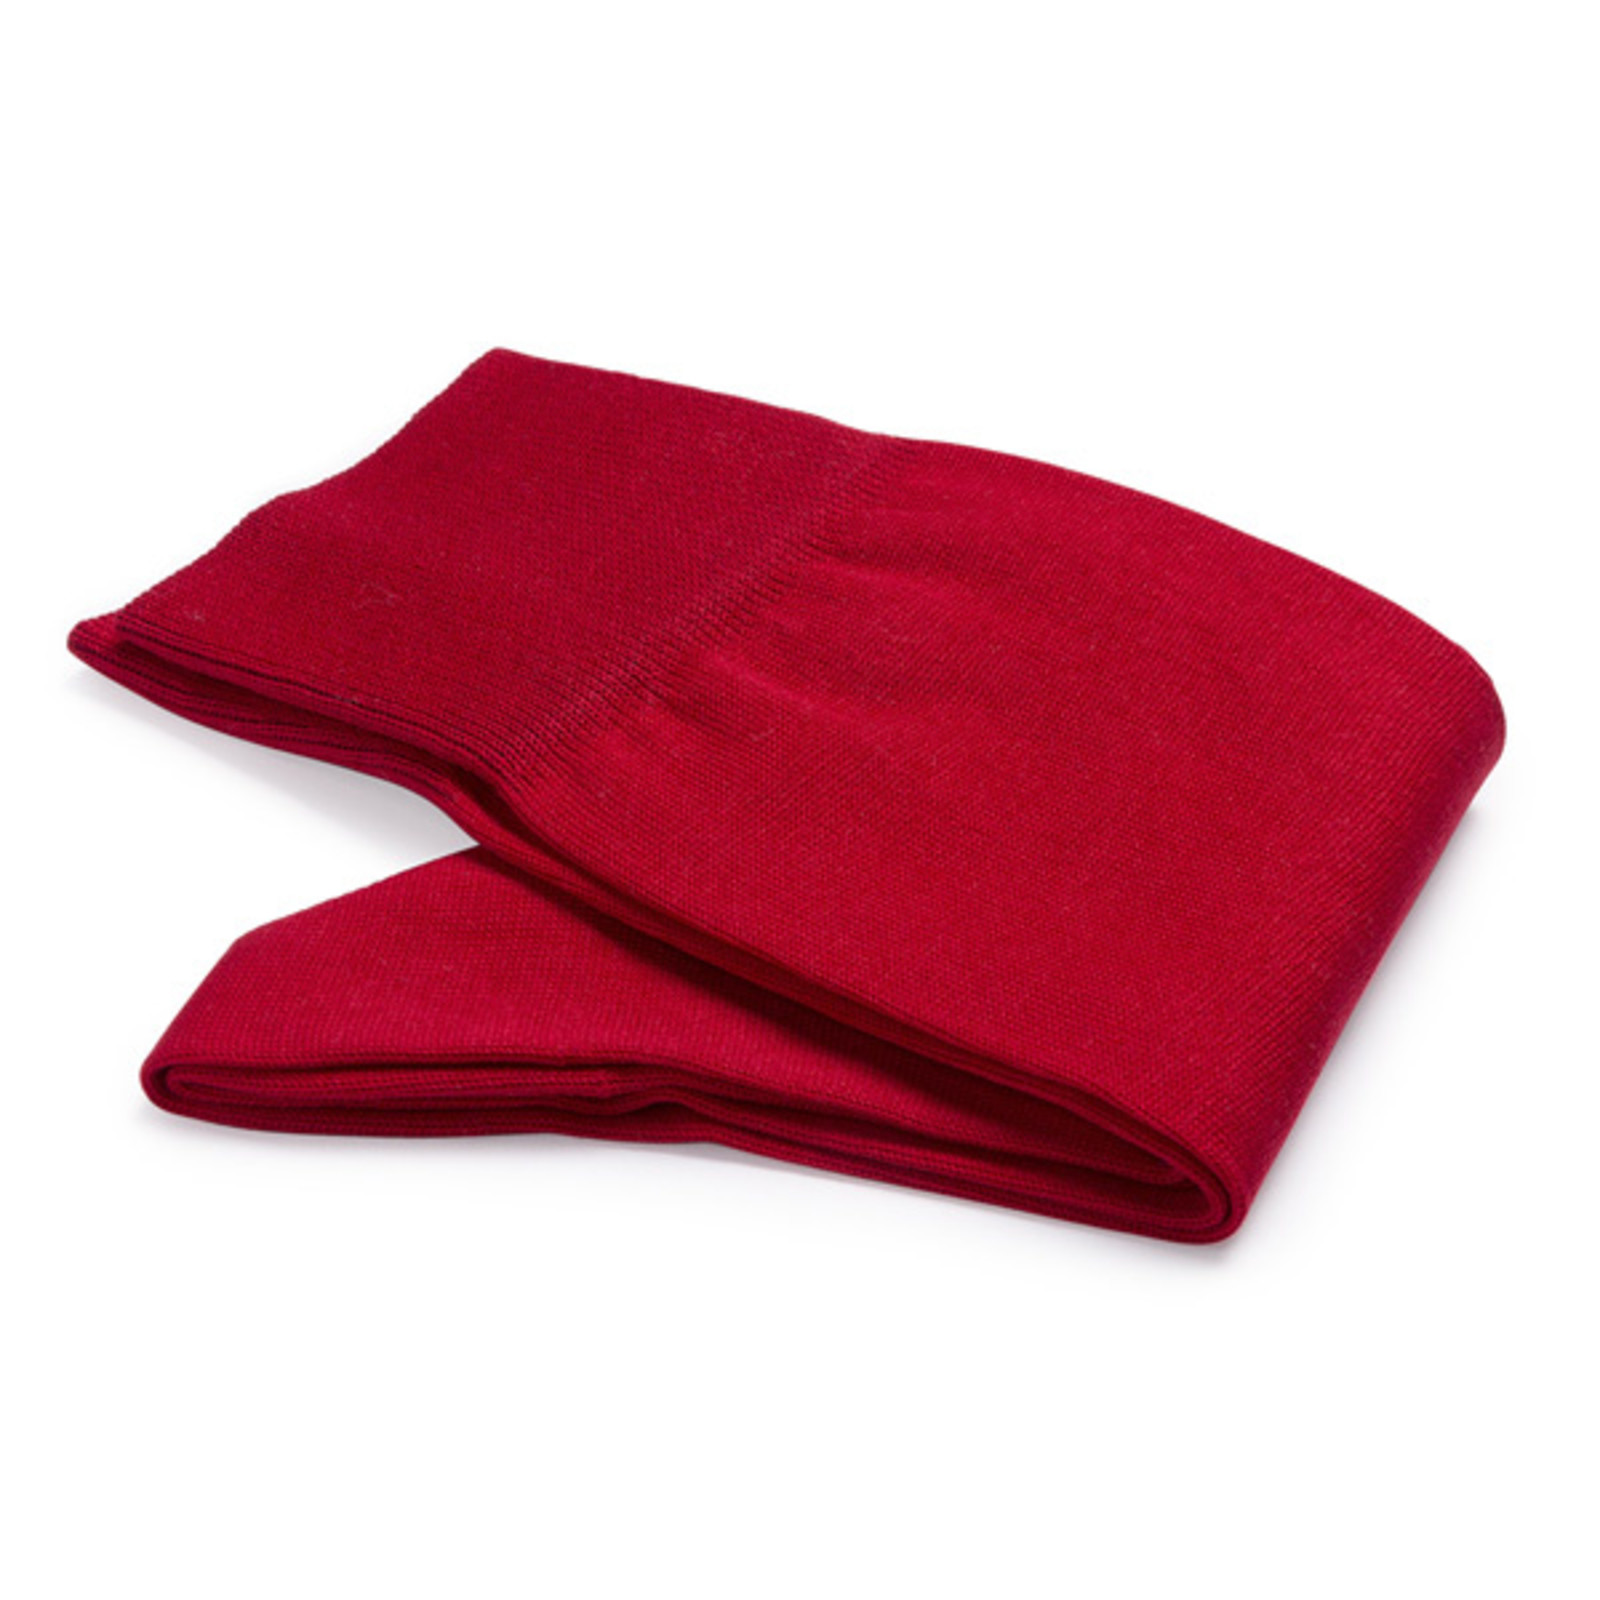 Carlo Lanza Roten Socken Baumwolle